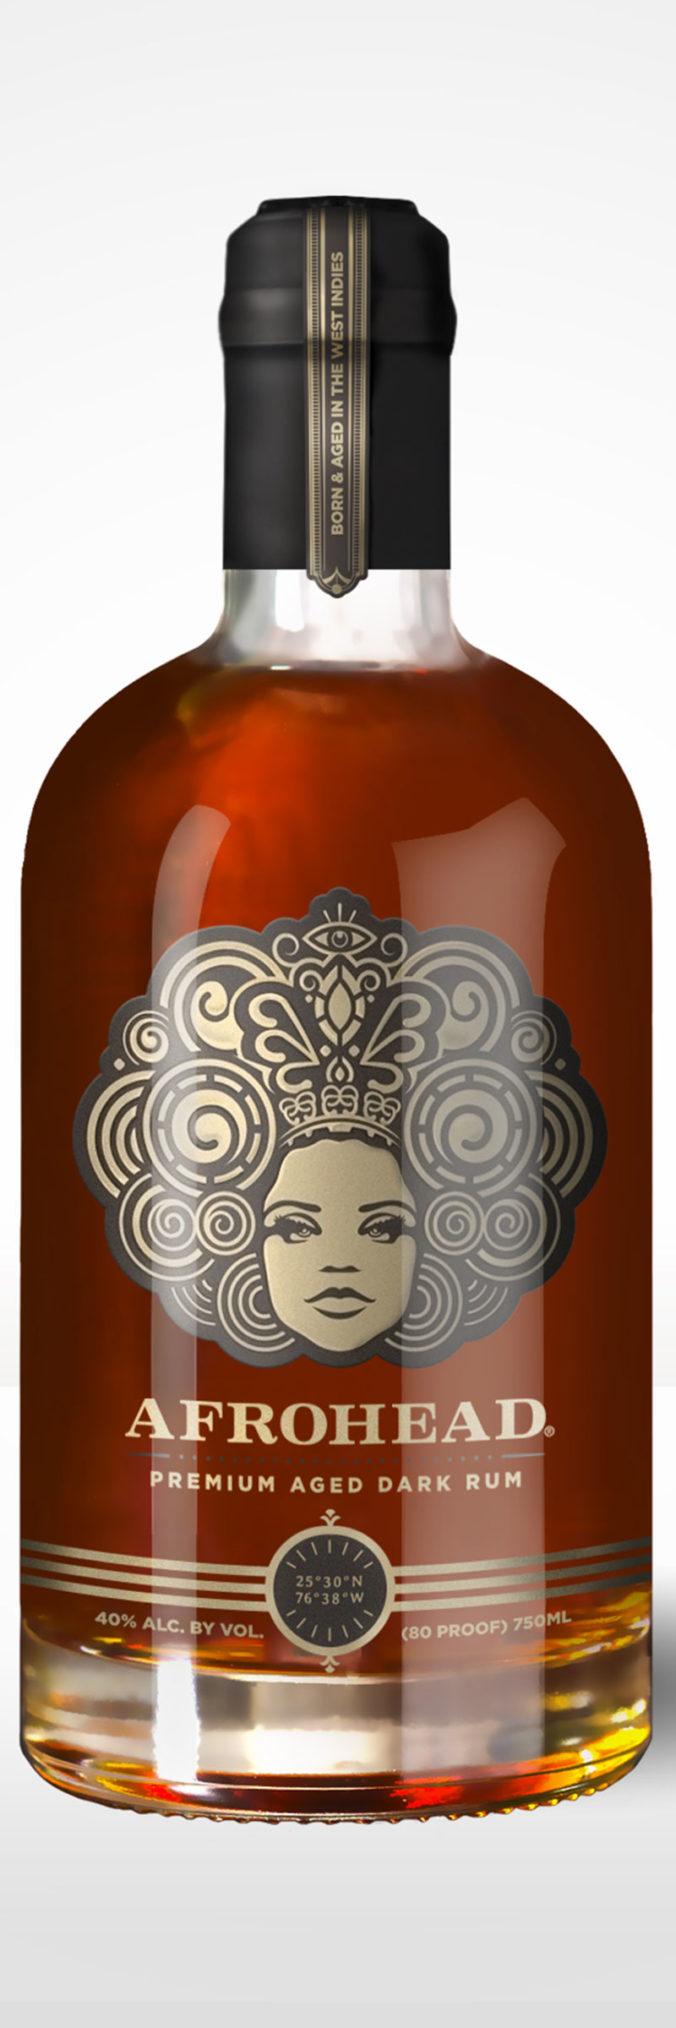 Afrohead Original aged rum from Trinidad